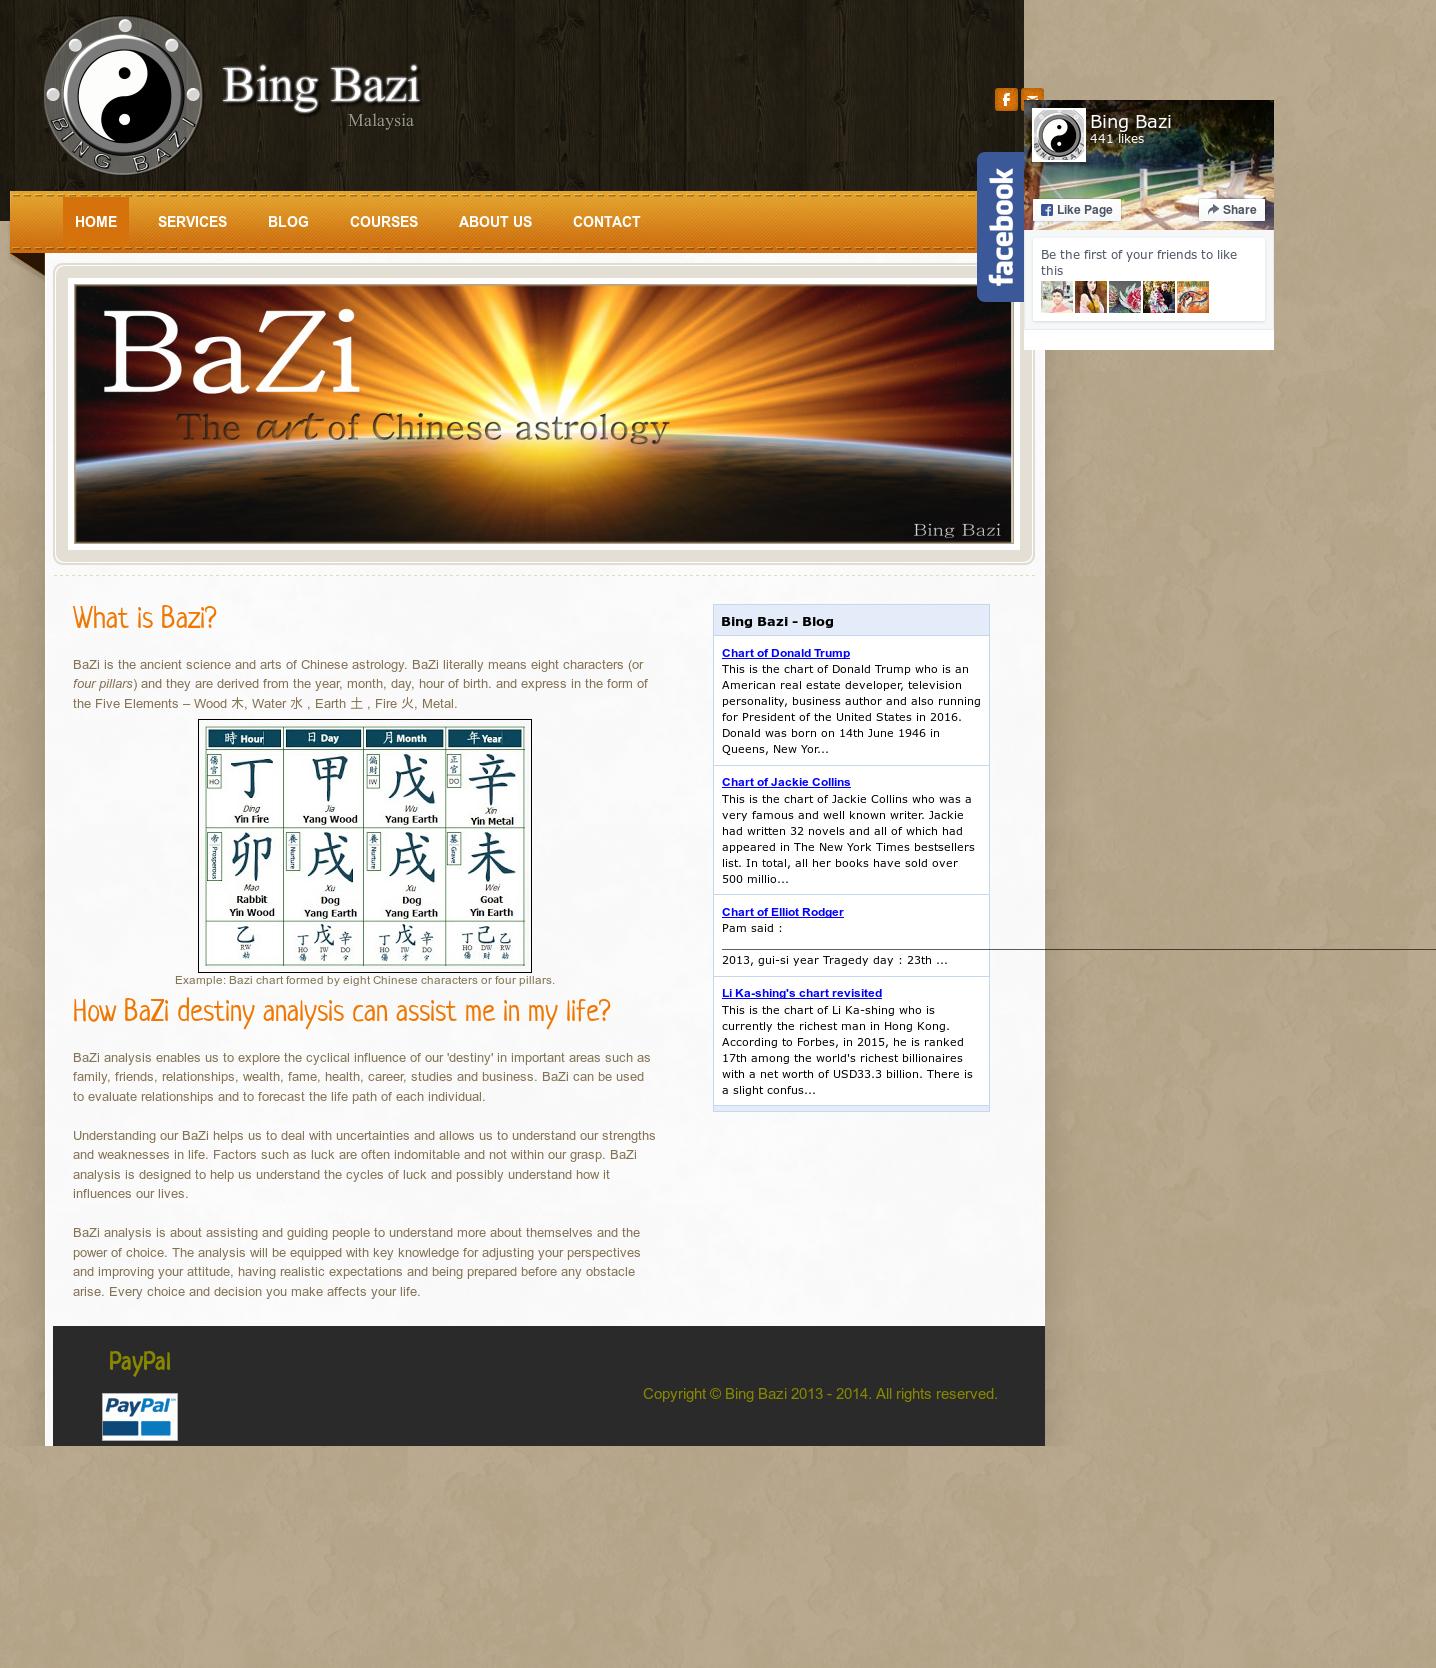 Owler Reports - Bing Bazi Blog Heavenly Virtue Noble